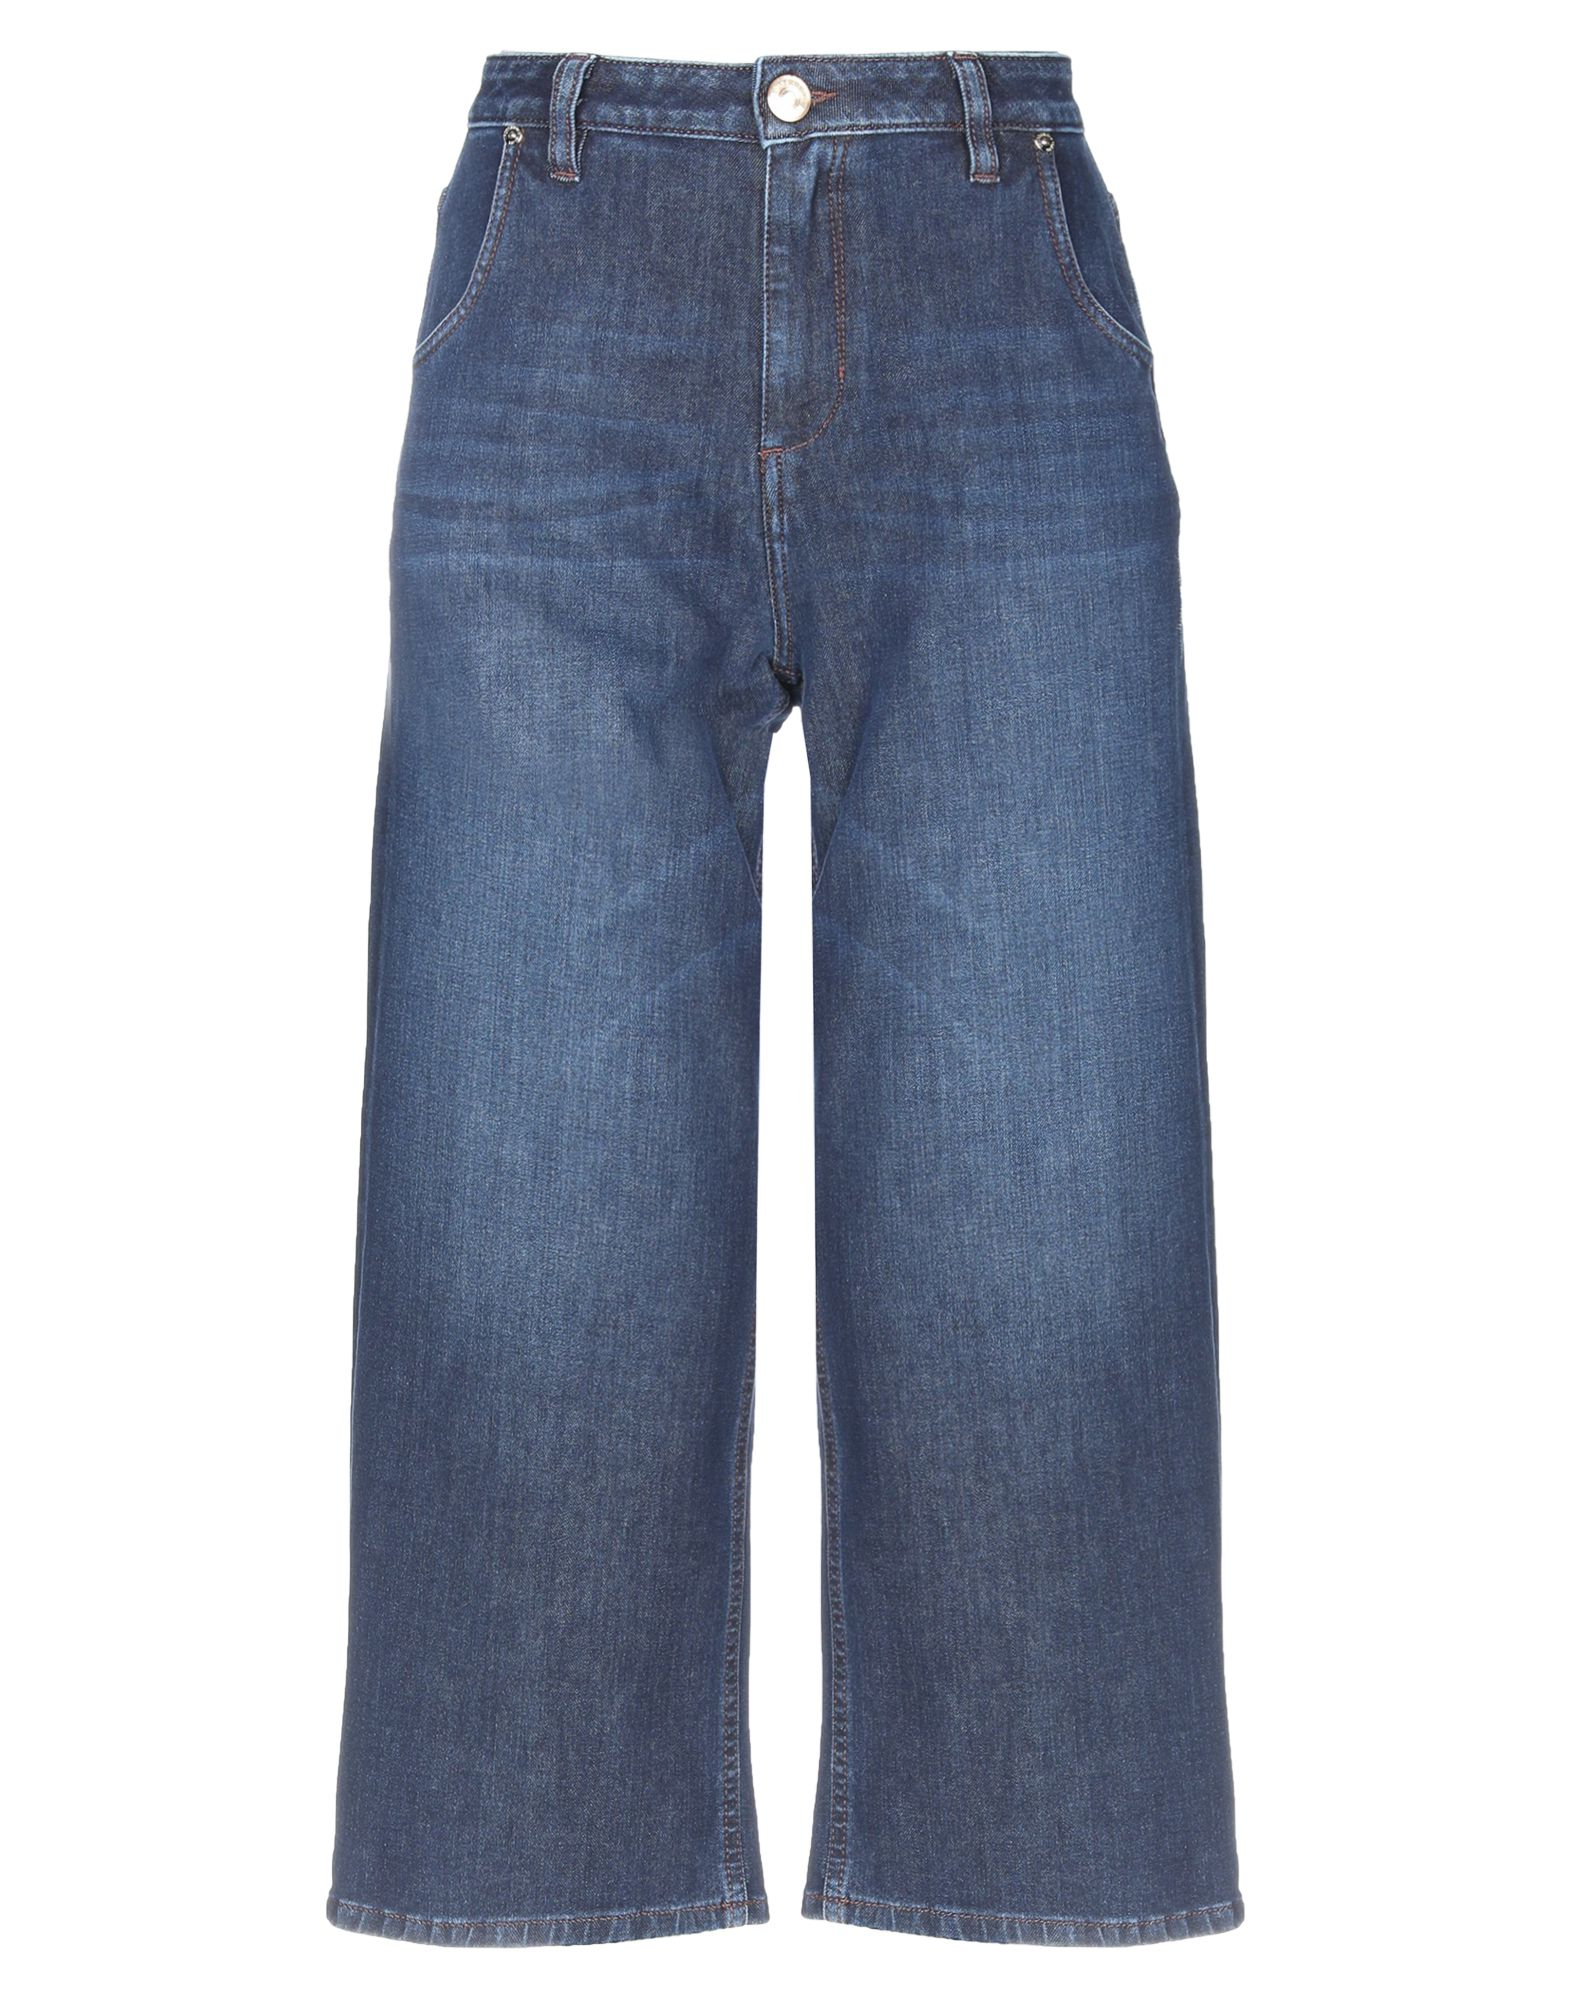 TRUSSARDI JEANS Джинсовые брюки-капри trussardi jeans брюки капри